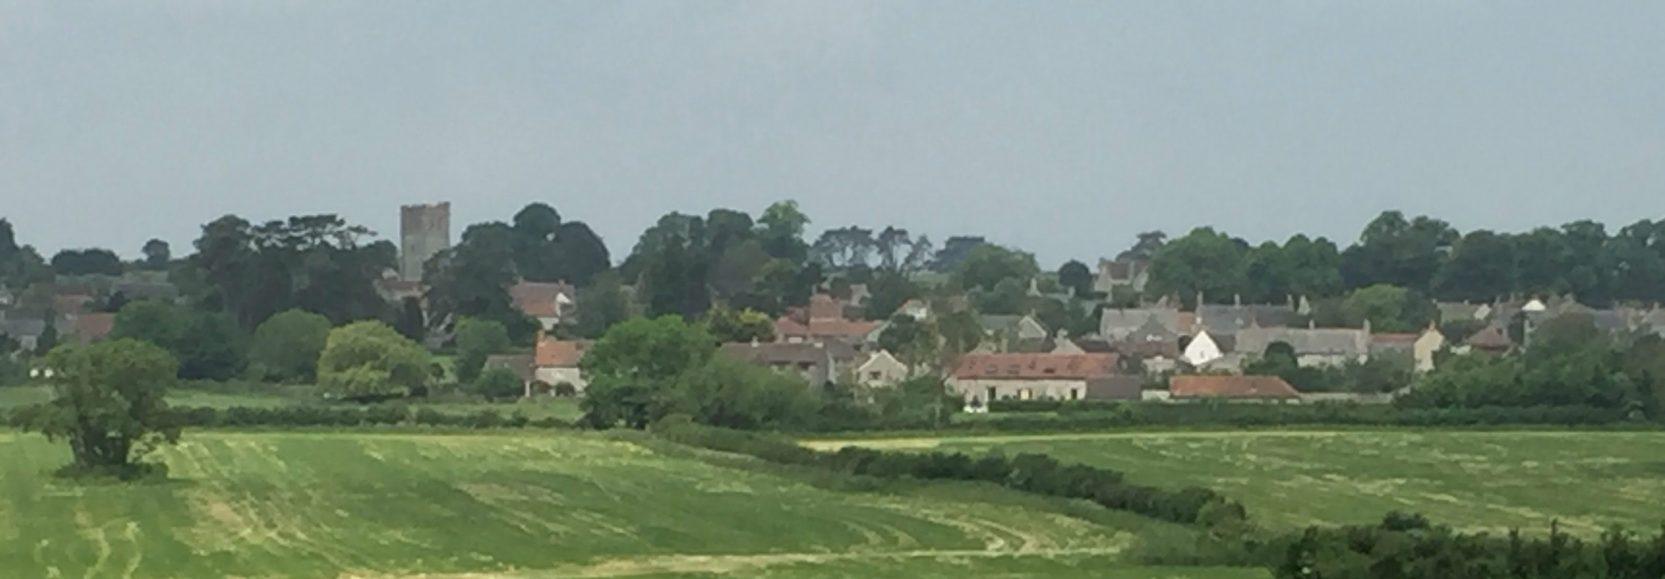 Kingsdon Village